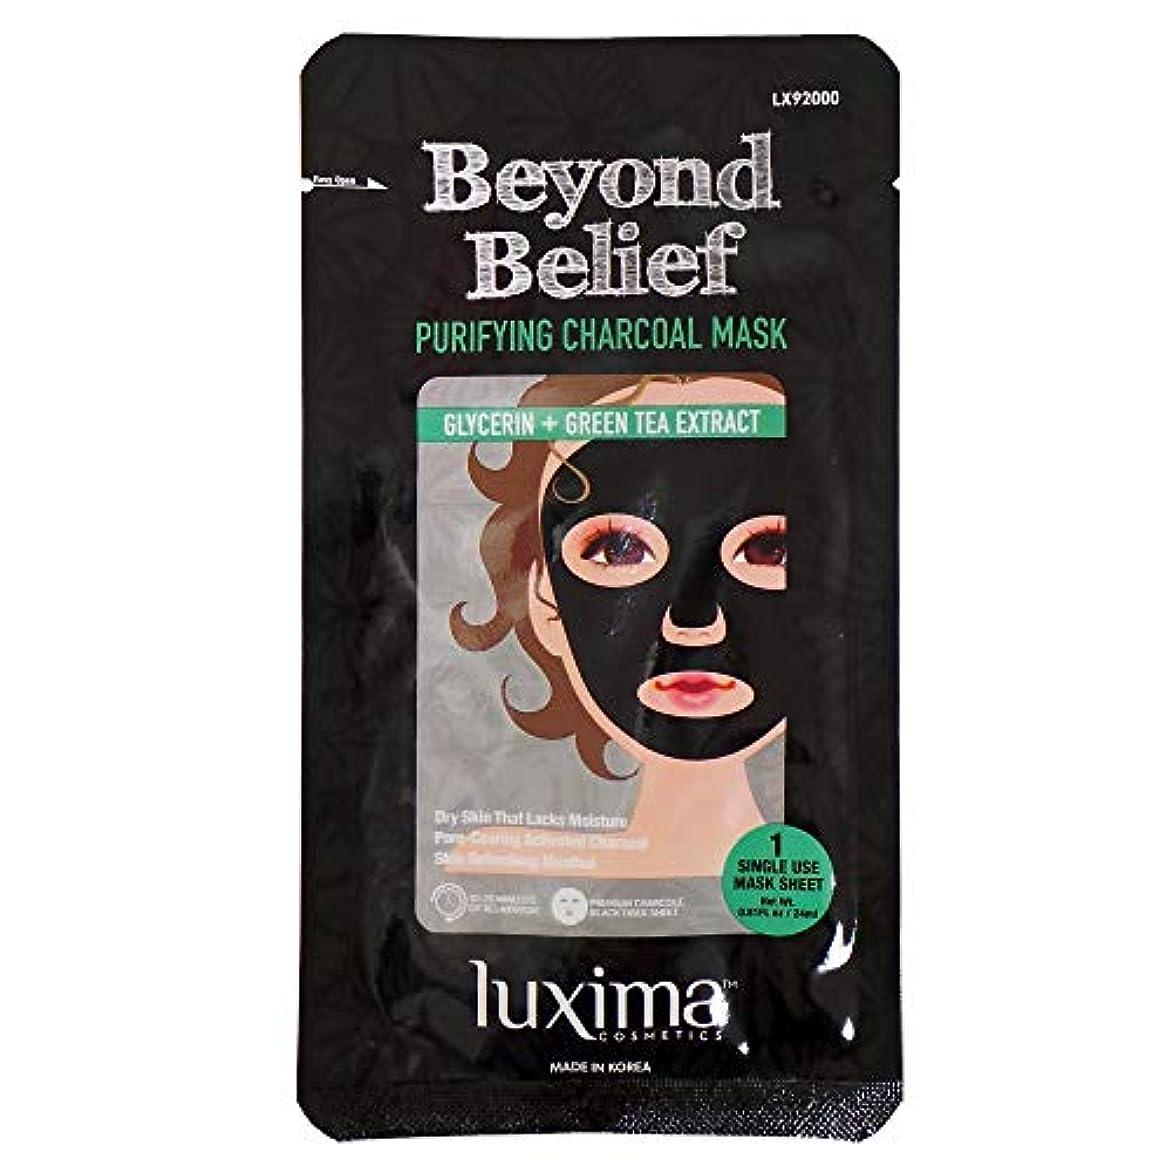 LUXIMA Beyond Belief Purifying Charcoal Mask (並行輸入品)